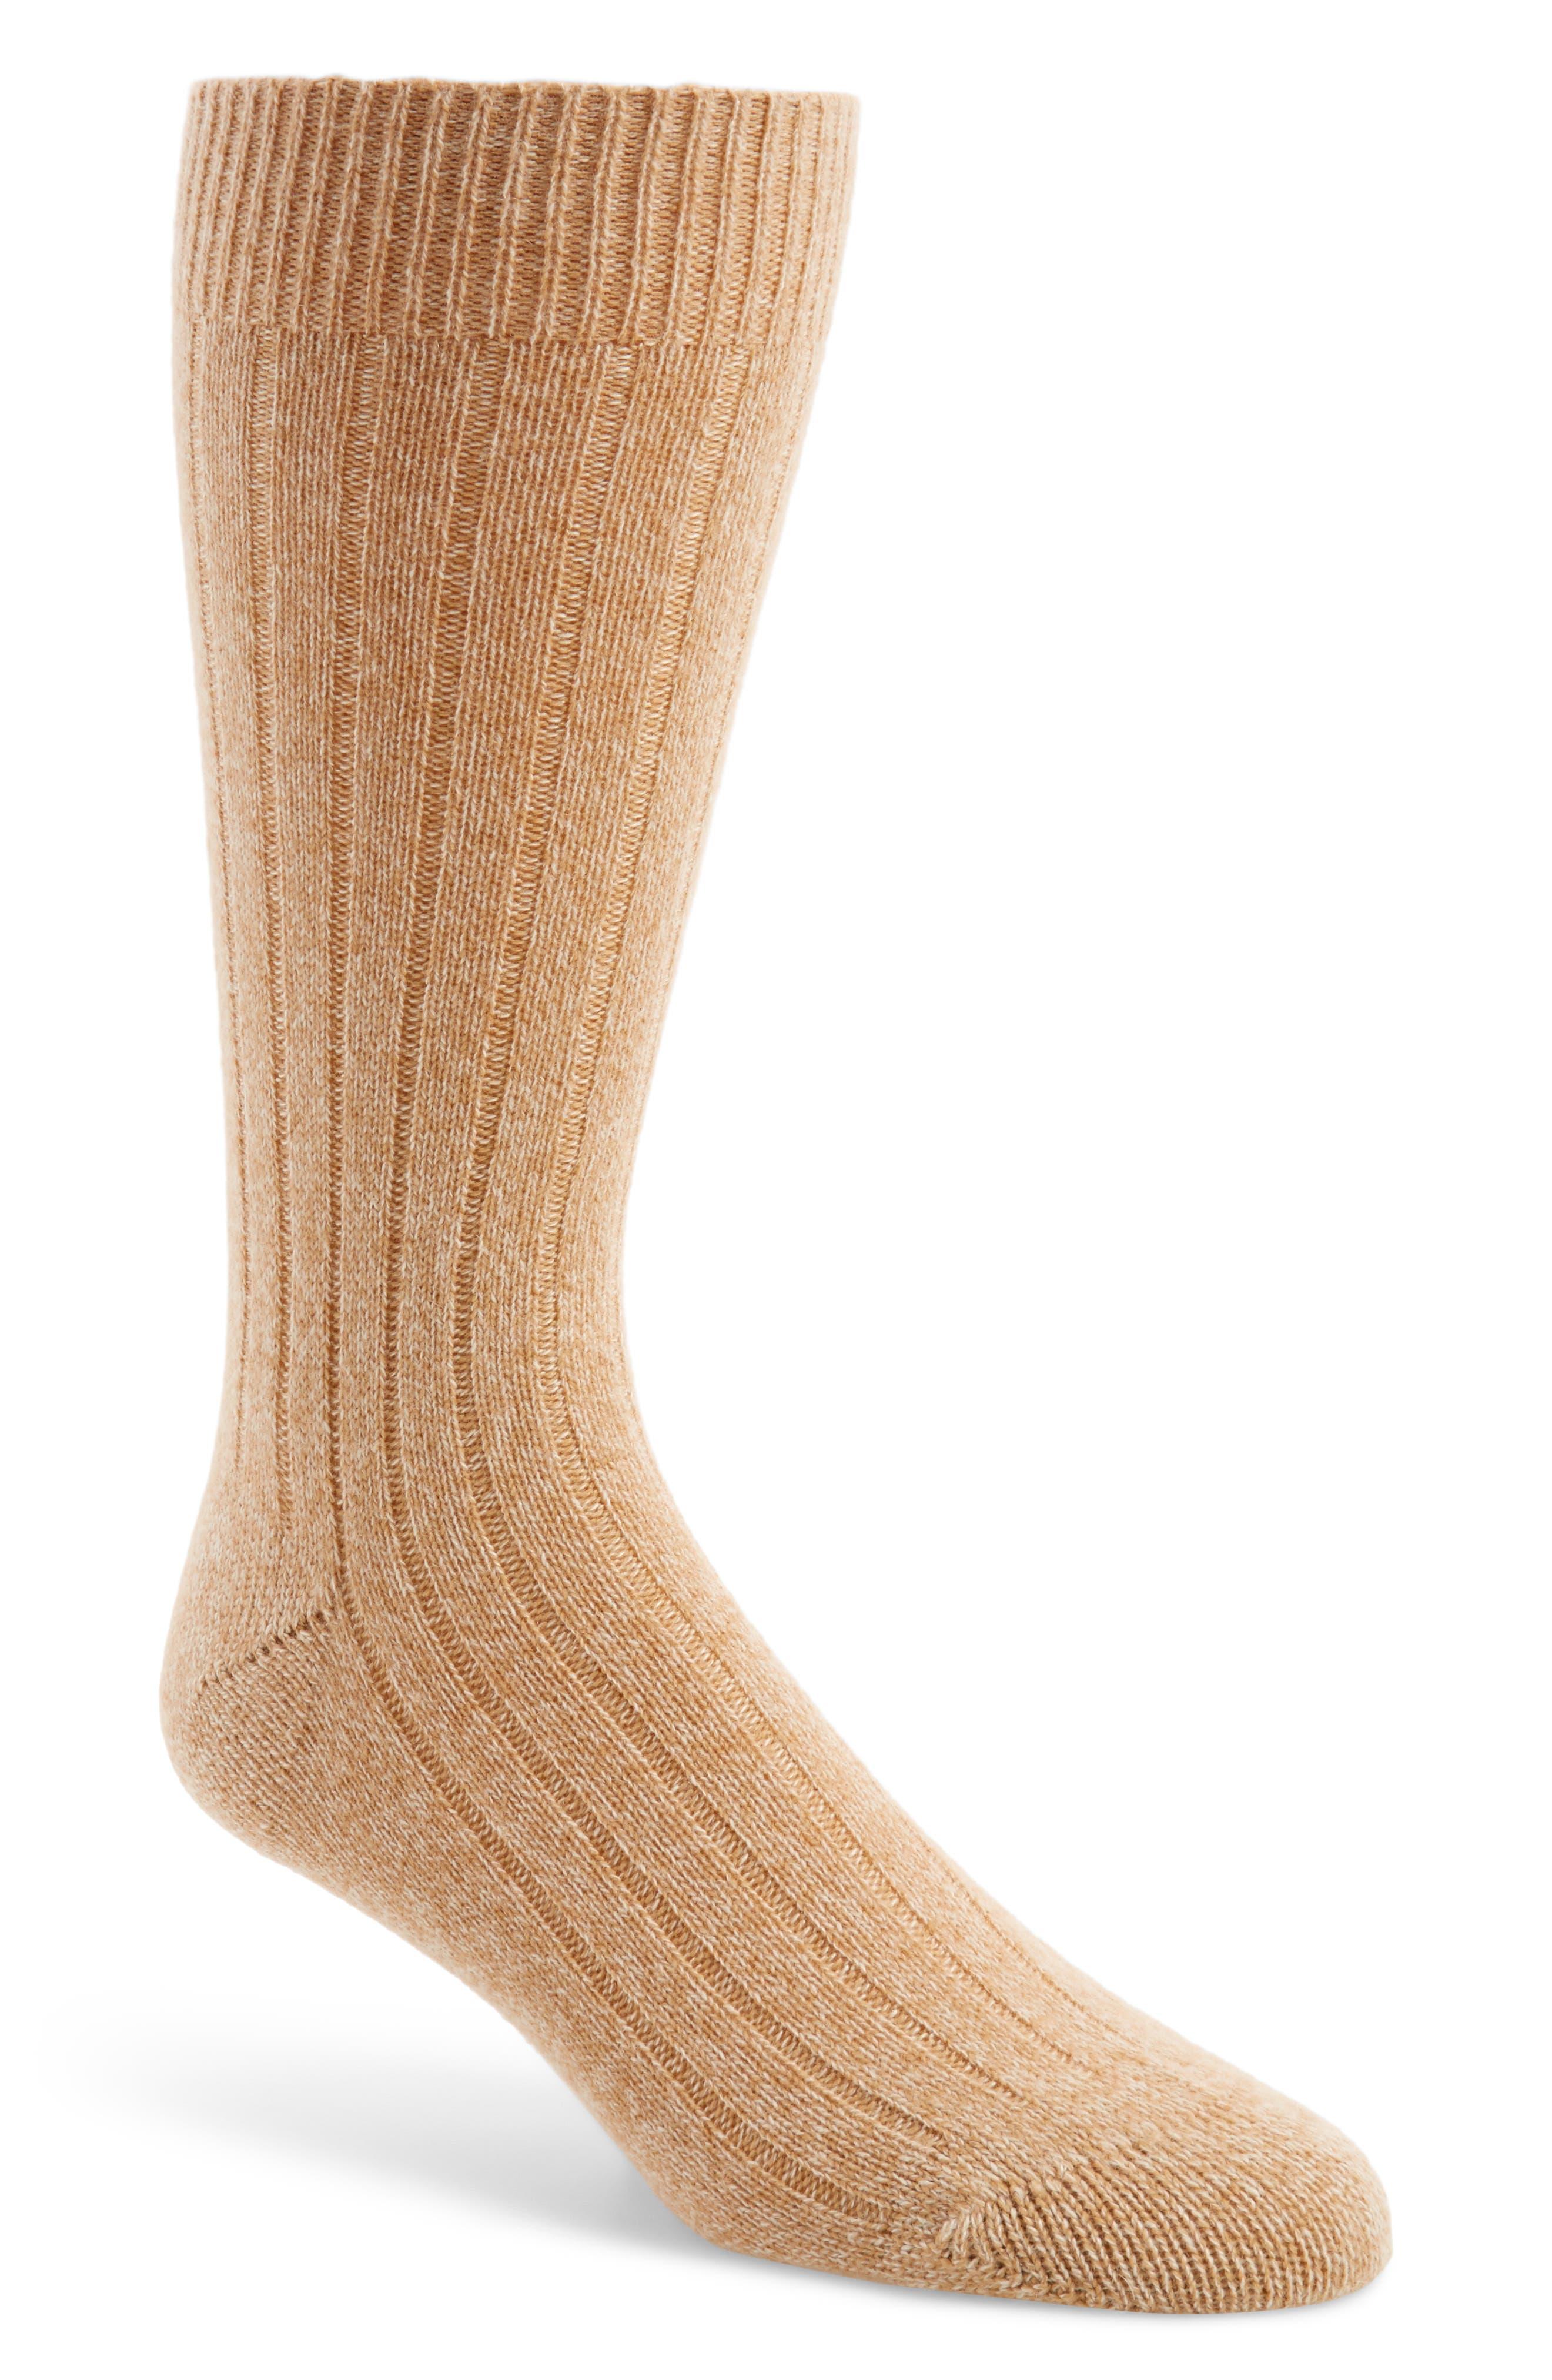 'Waddington' Cashmere Blend Mid Calf Socks,                         Main,                         color,